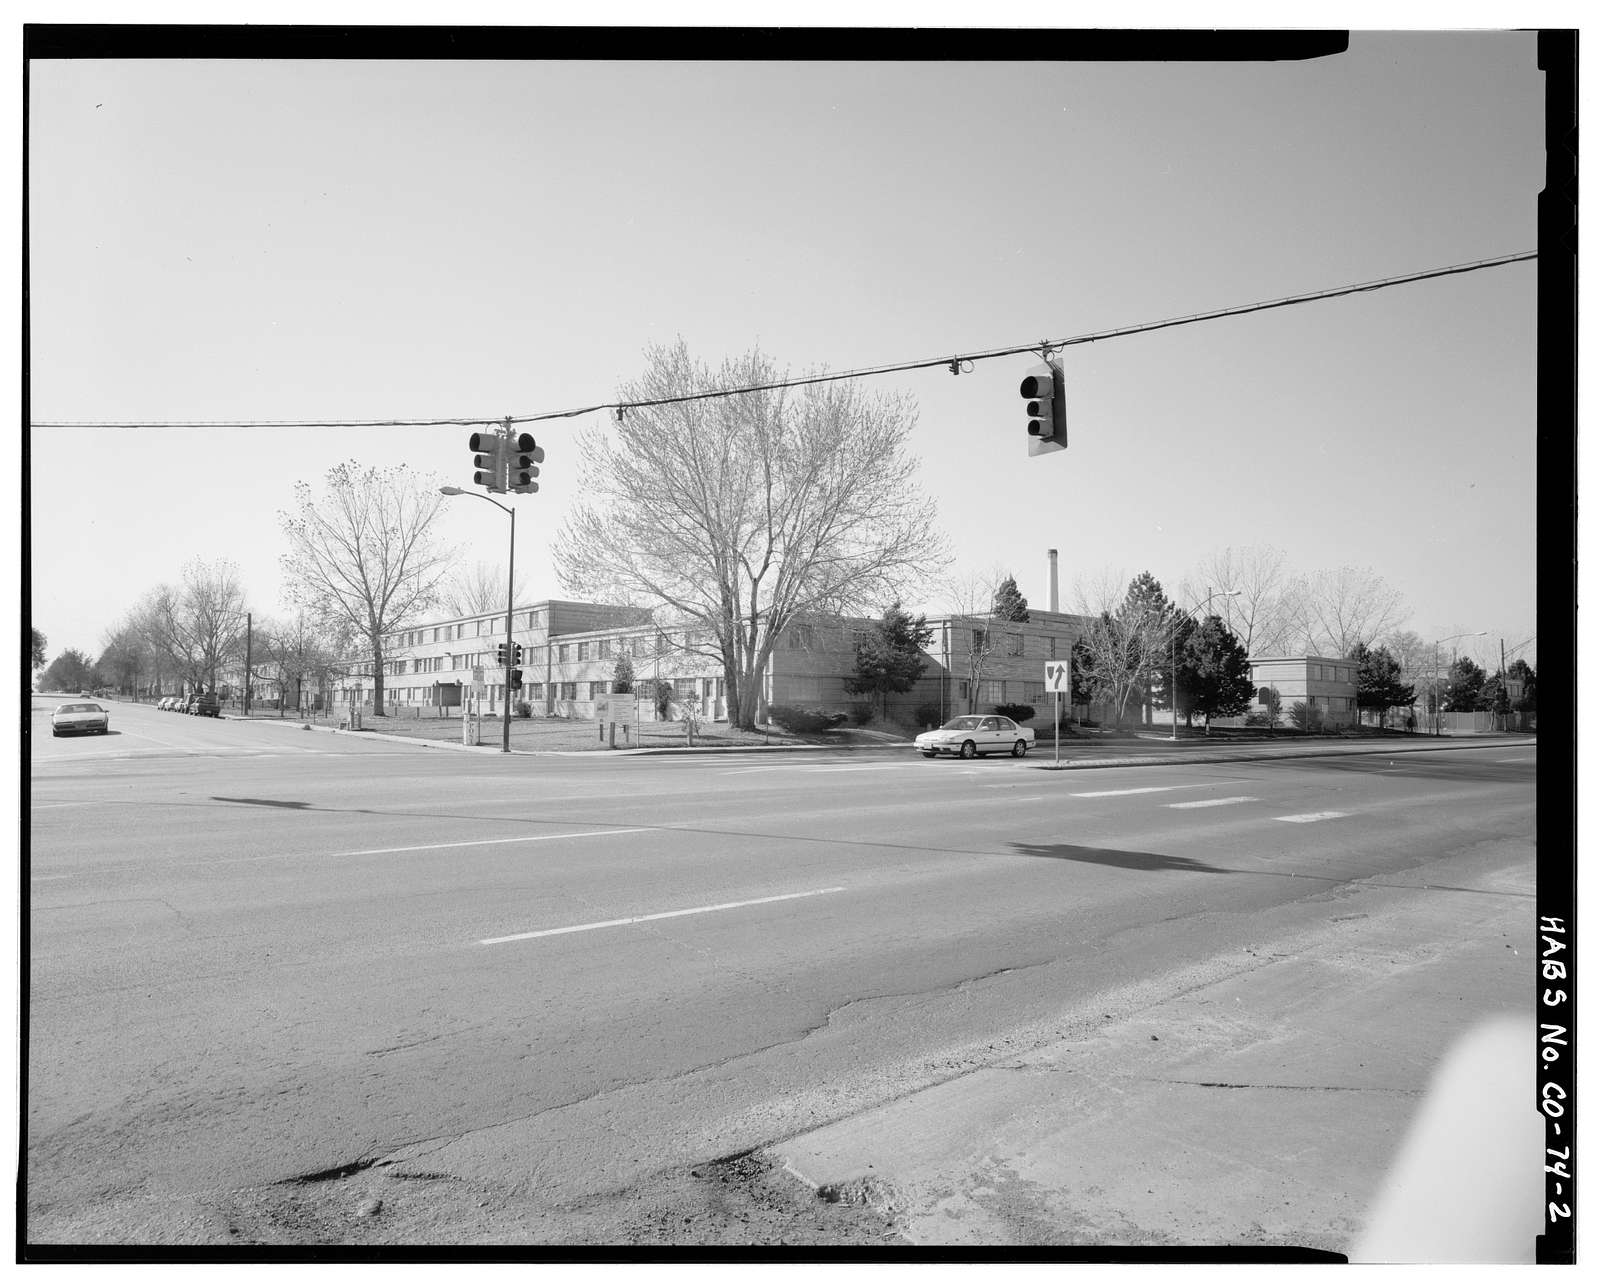 Lincoln Park Homes, West Colfax Avenue & Marispoa Street, Denver, Denver County, CO